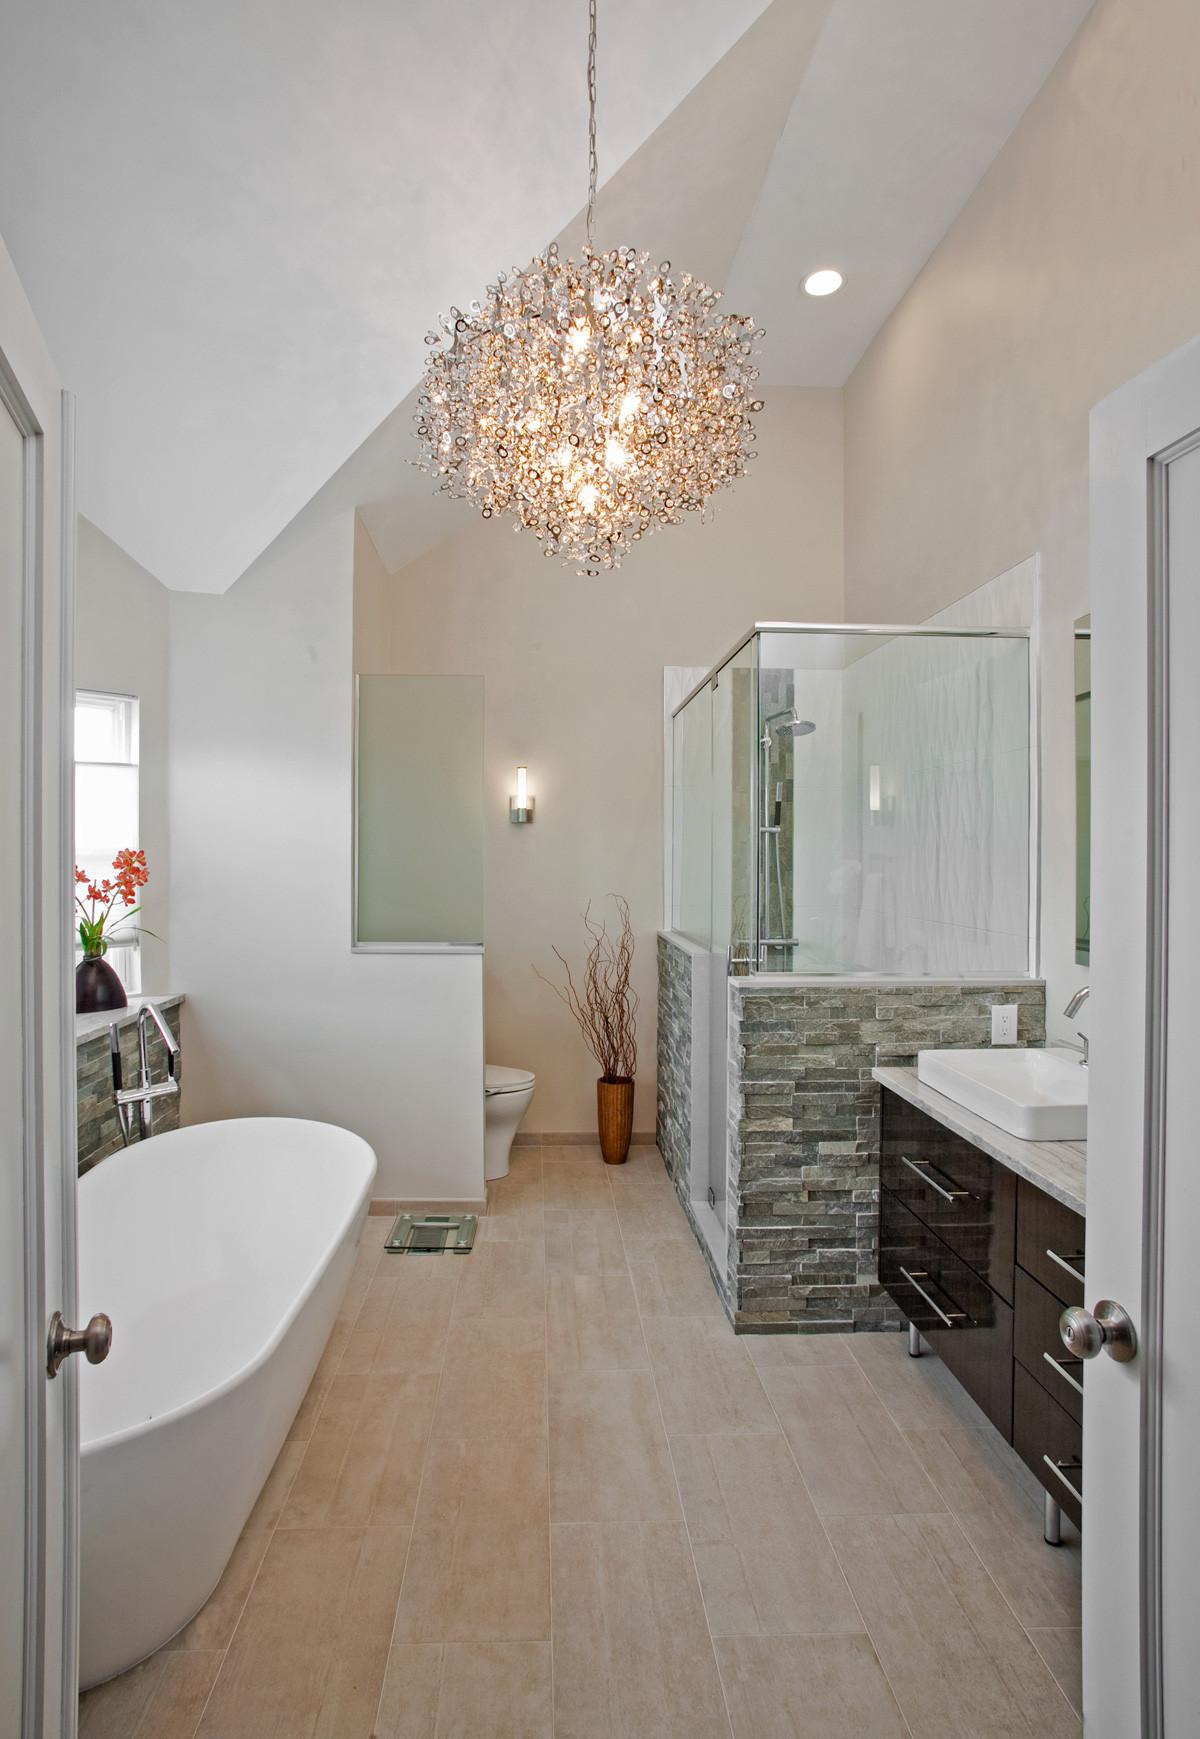 Contemporary Bathroom Design  Modern Bathrooms Designs and Remodeling